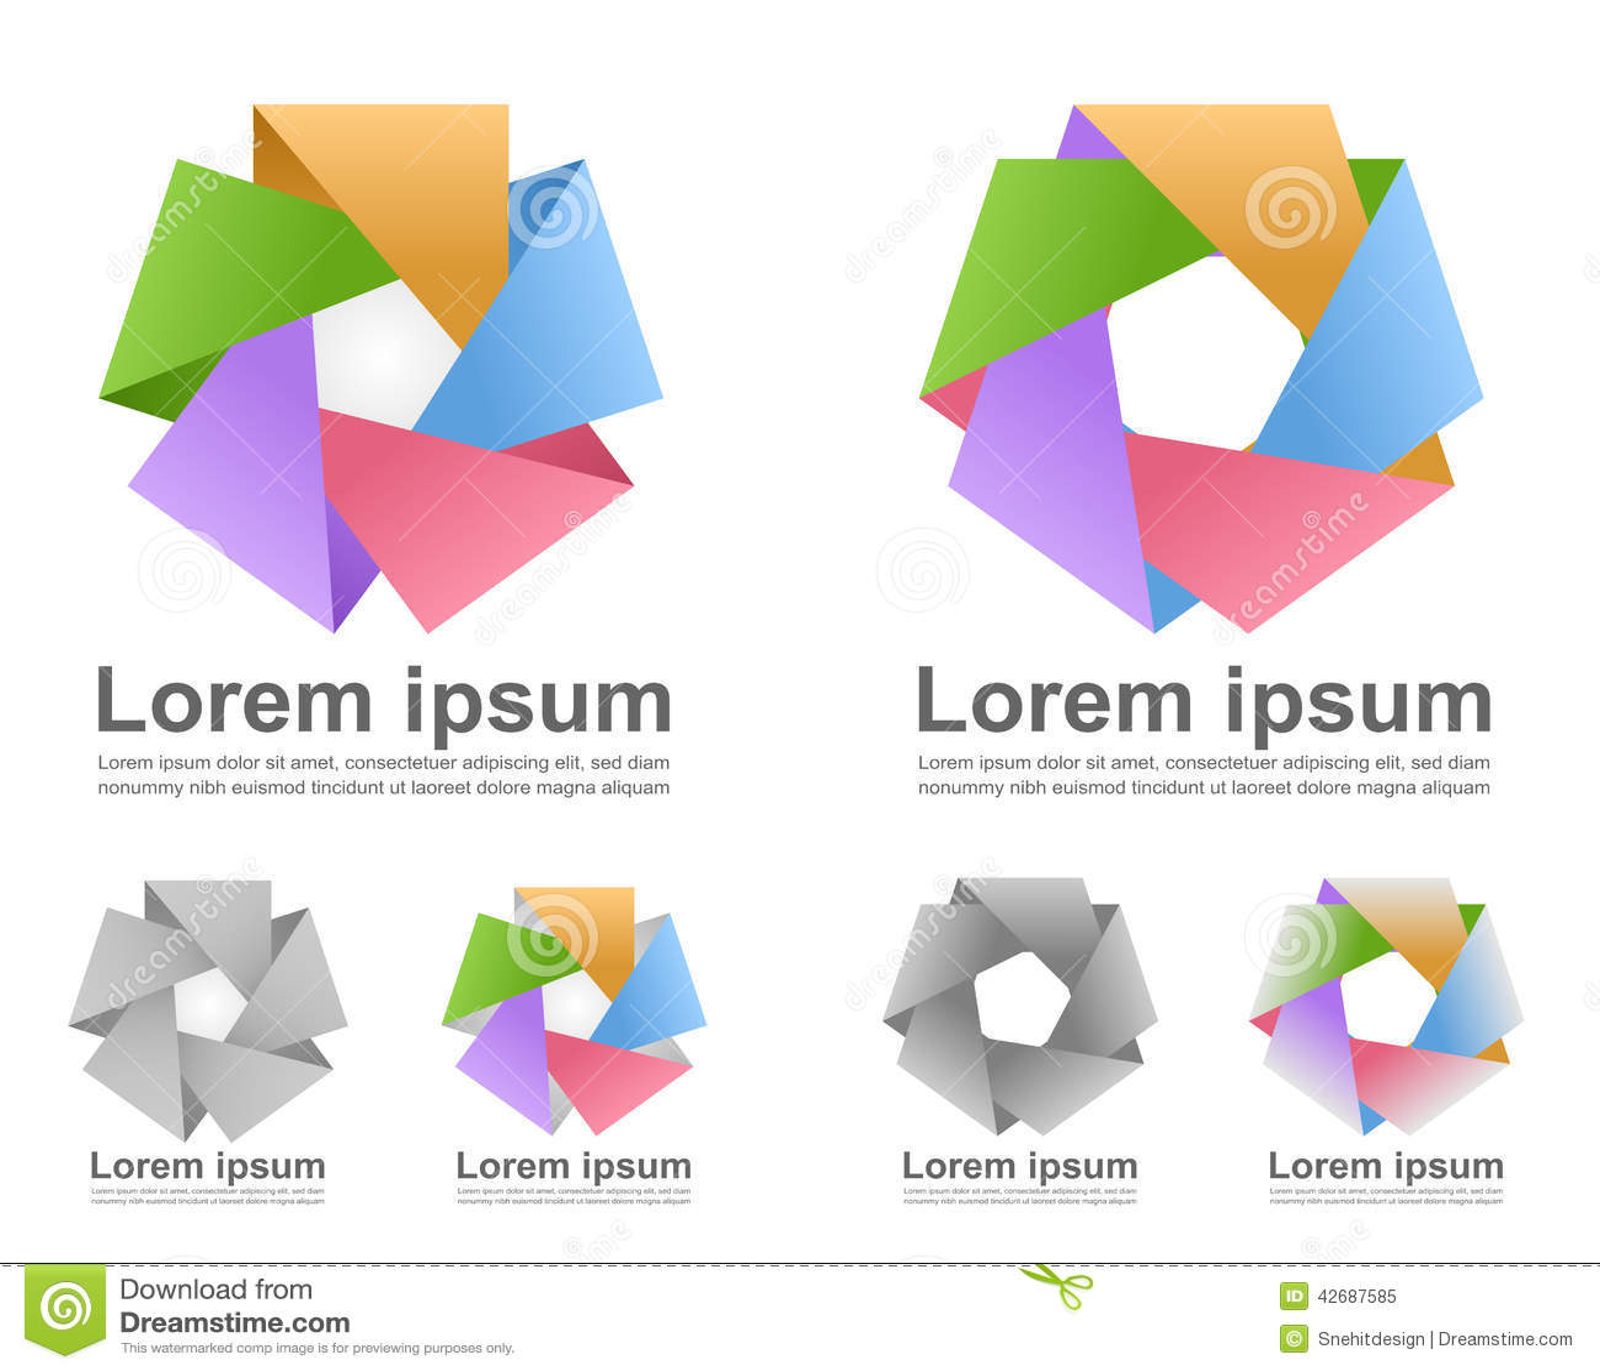 Colorful infinite loop icons